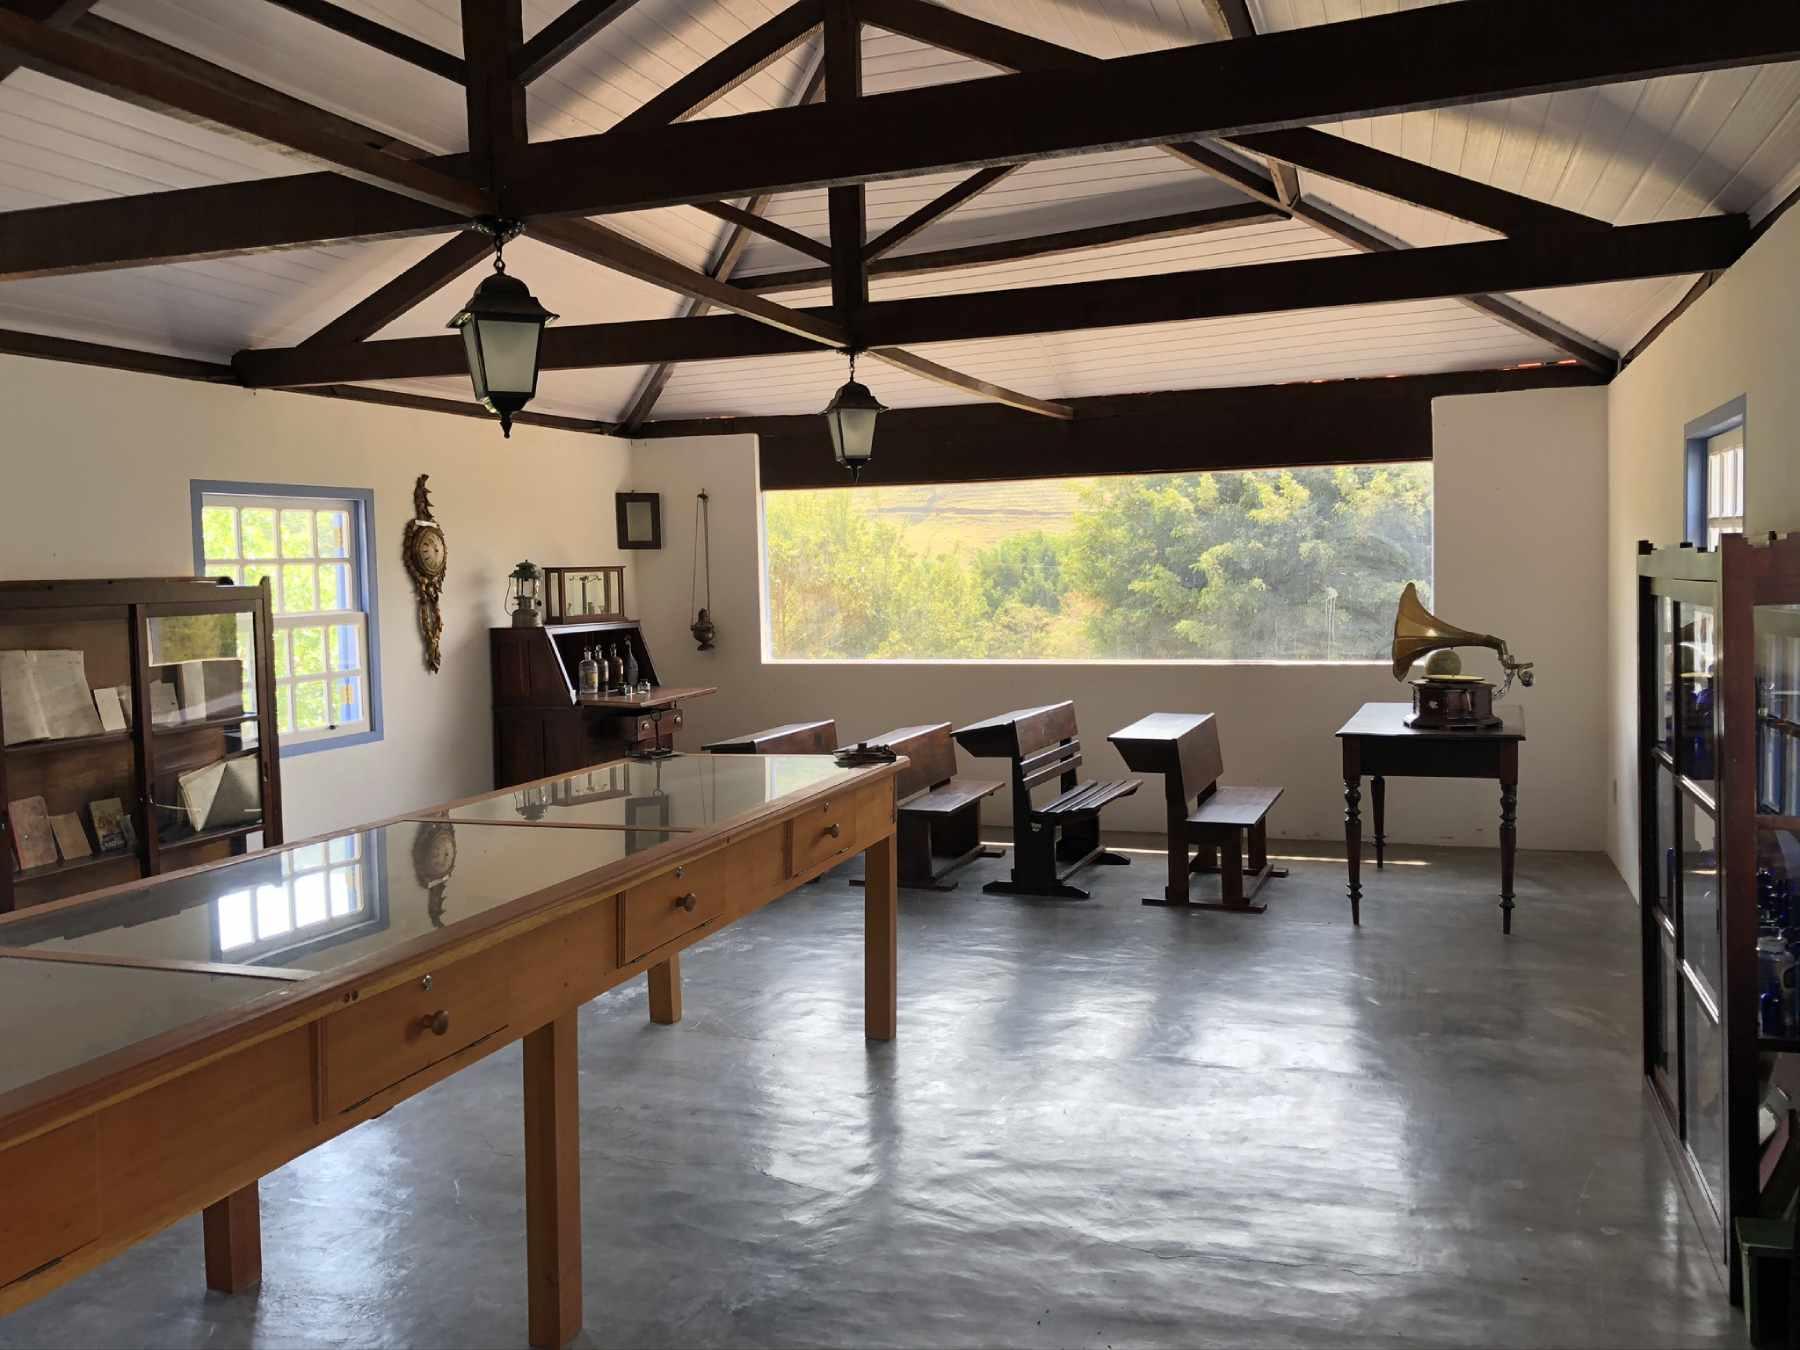 MUSEU DA FAZENDA TRANSWAL